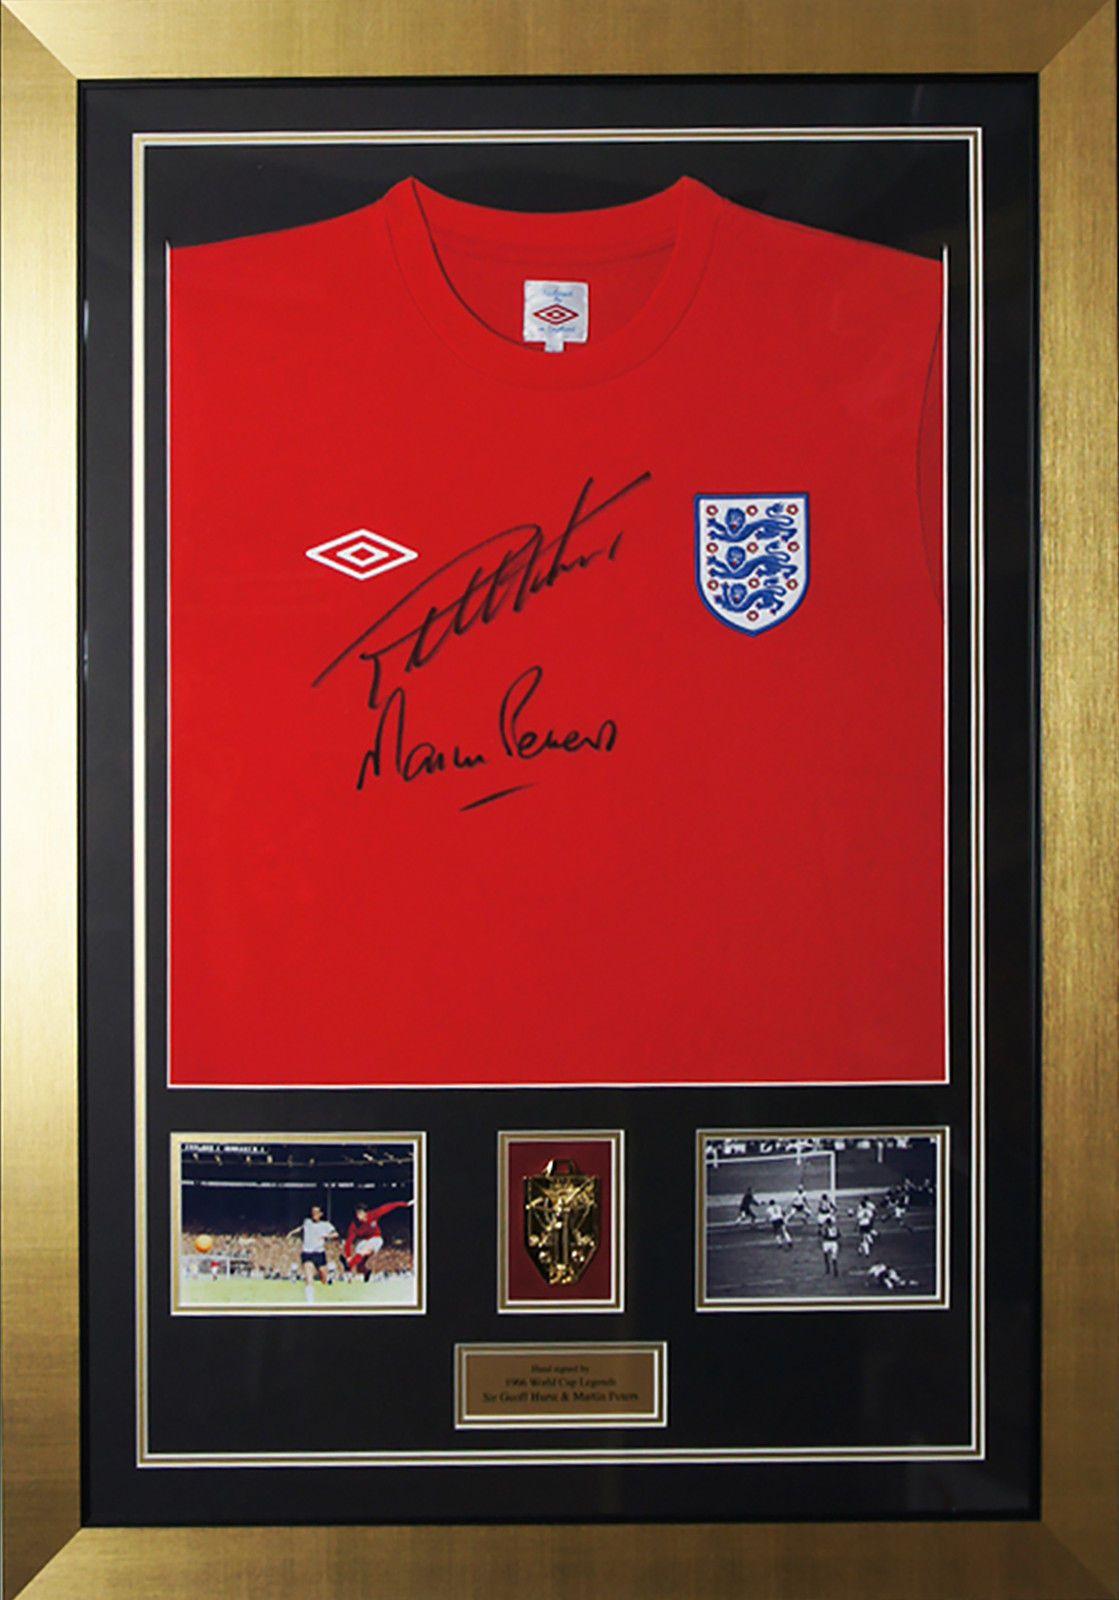 Geoff Hurst Signed England Replica Football Shirt In A Framed Presentation New